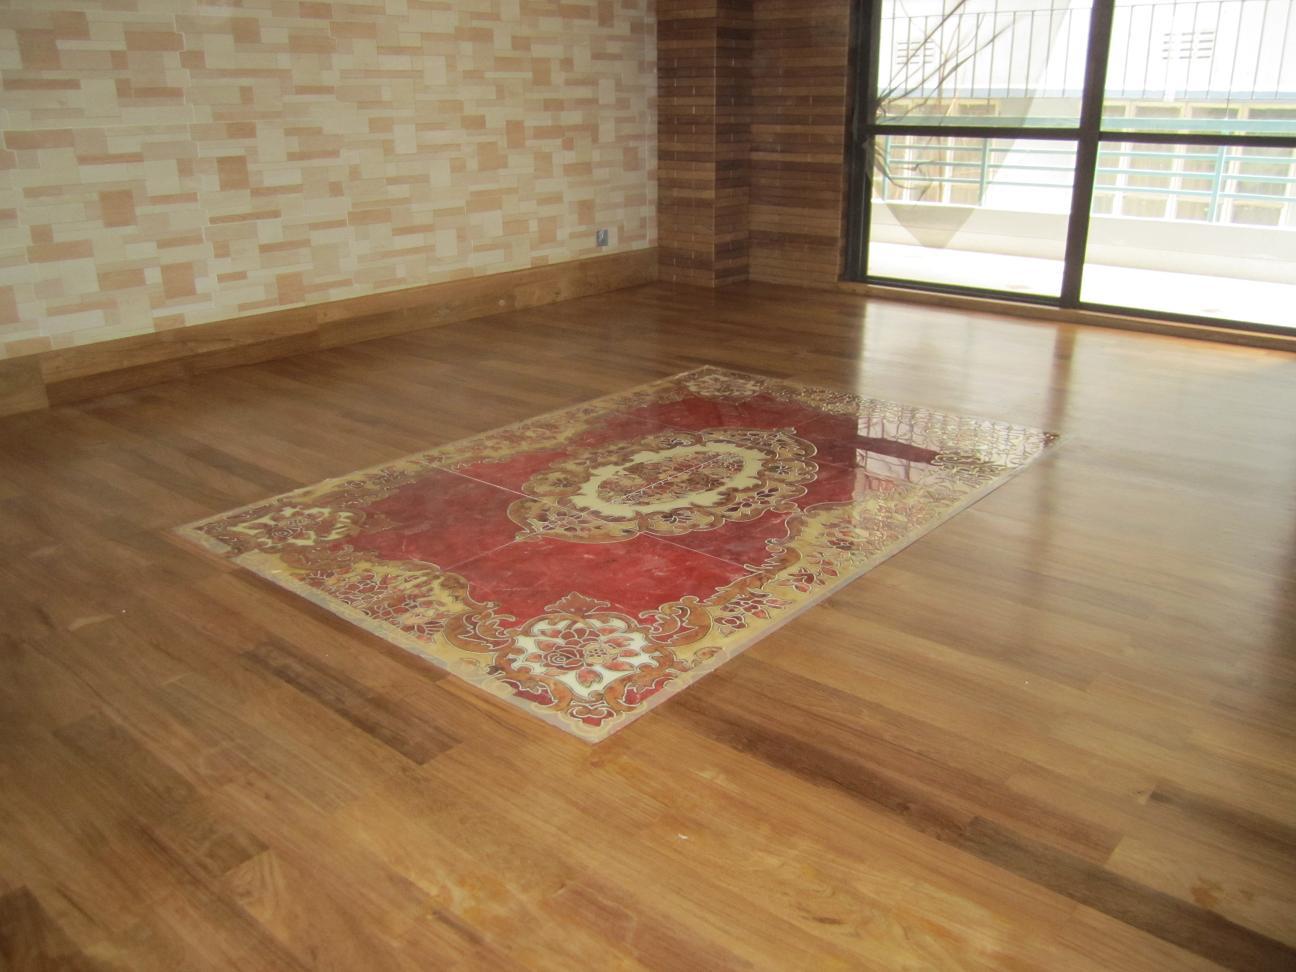 Wooden floor tiles clickbd wooden floor tiles clickbd large image 2 dailygadgetfo Gallery